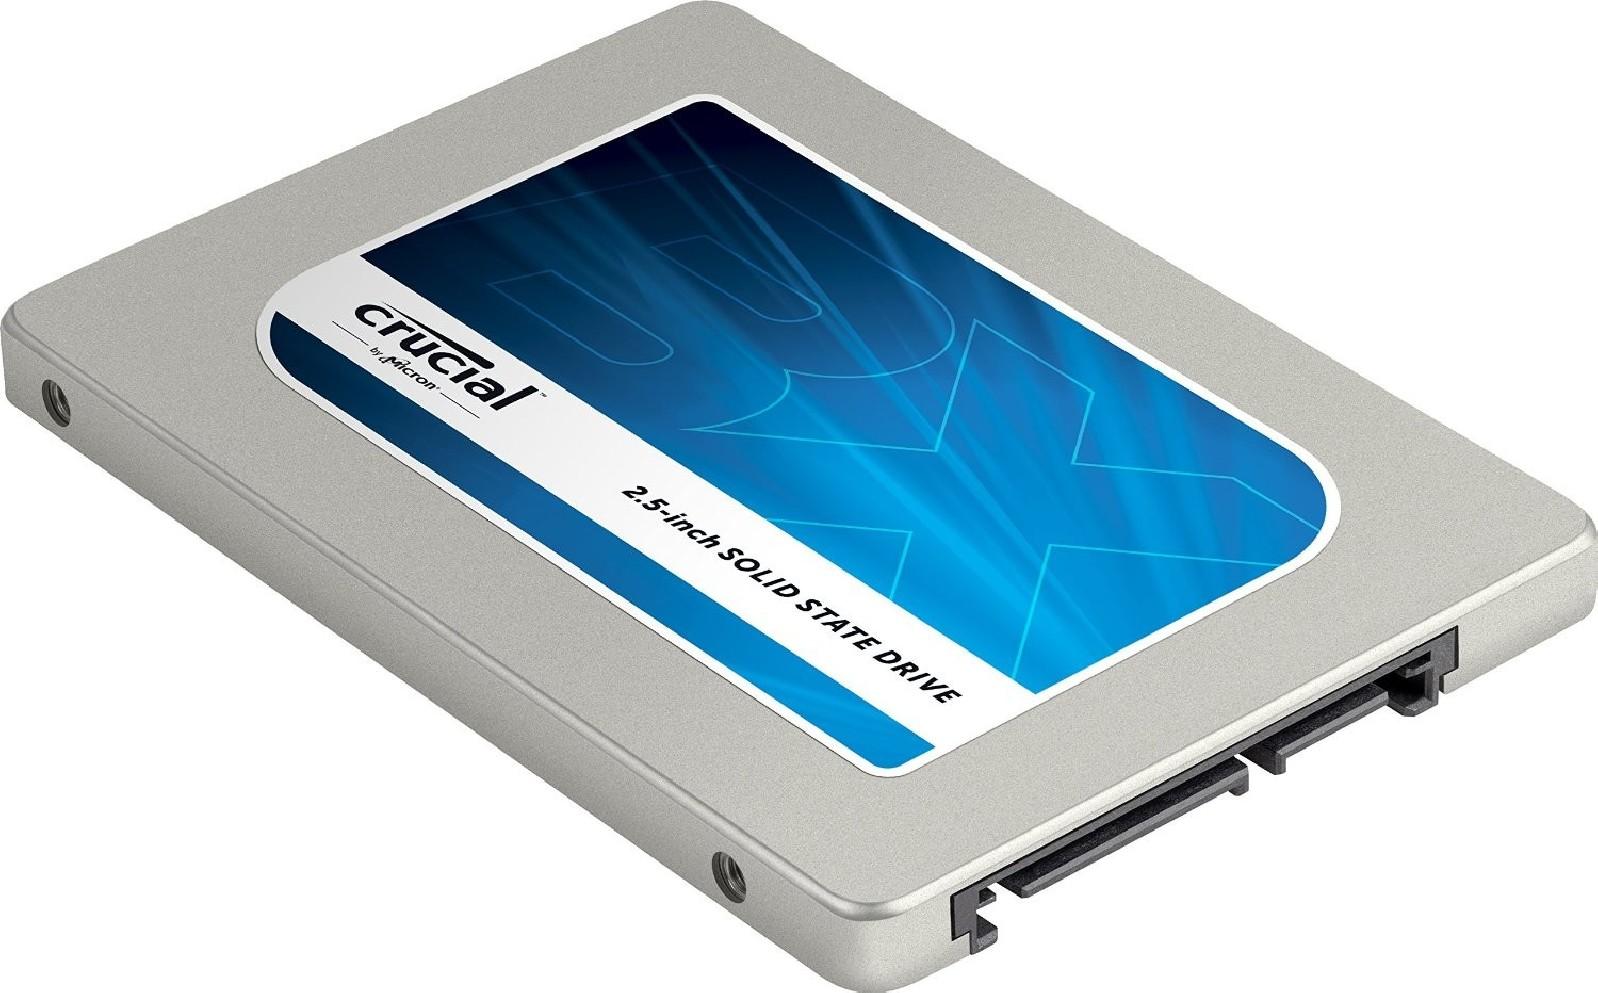 PRECIO DISCO SSD 150 GIGAS PARA PORTATIL AMAZON